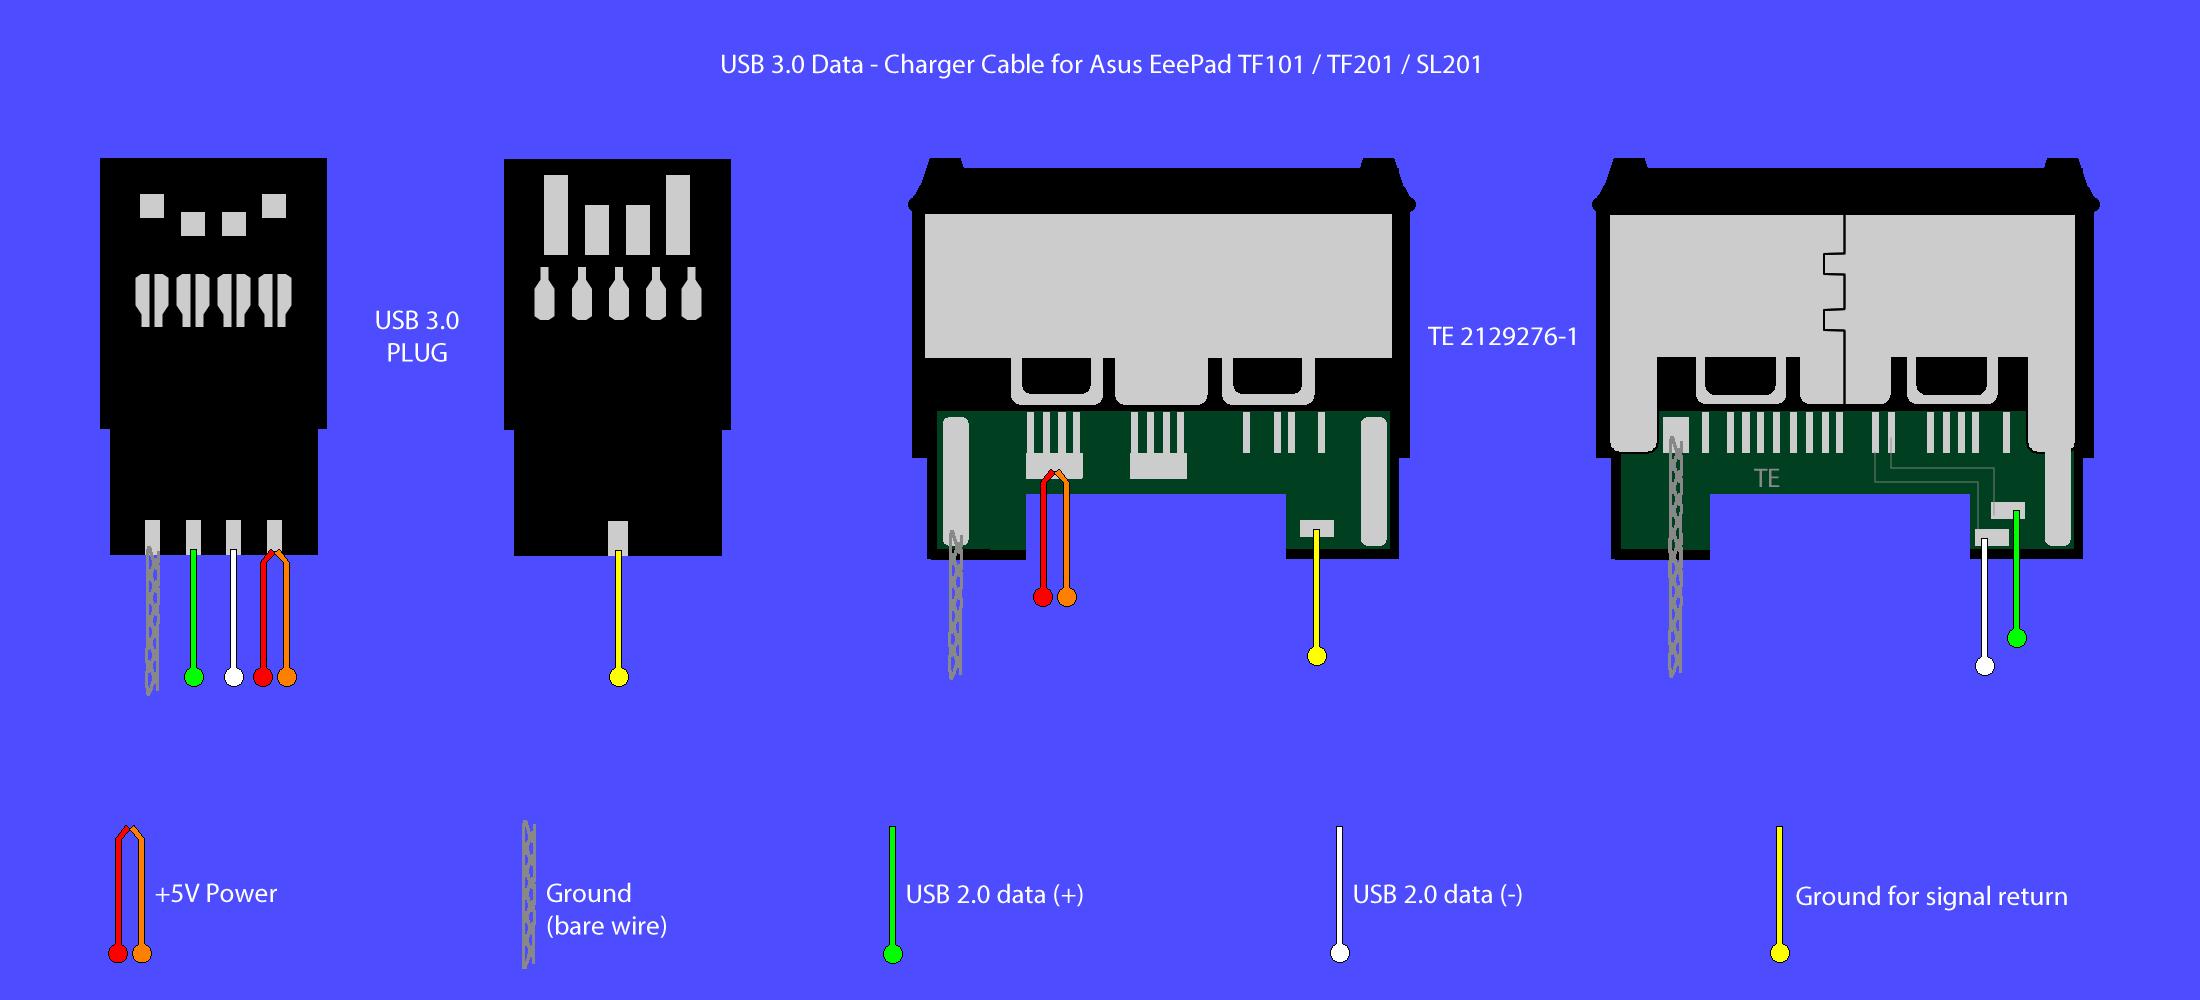 Manual De Ipod 2 Auto Electrical Wiring Diagram Lunar Meteorite Caravan